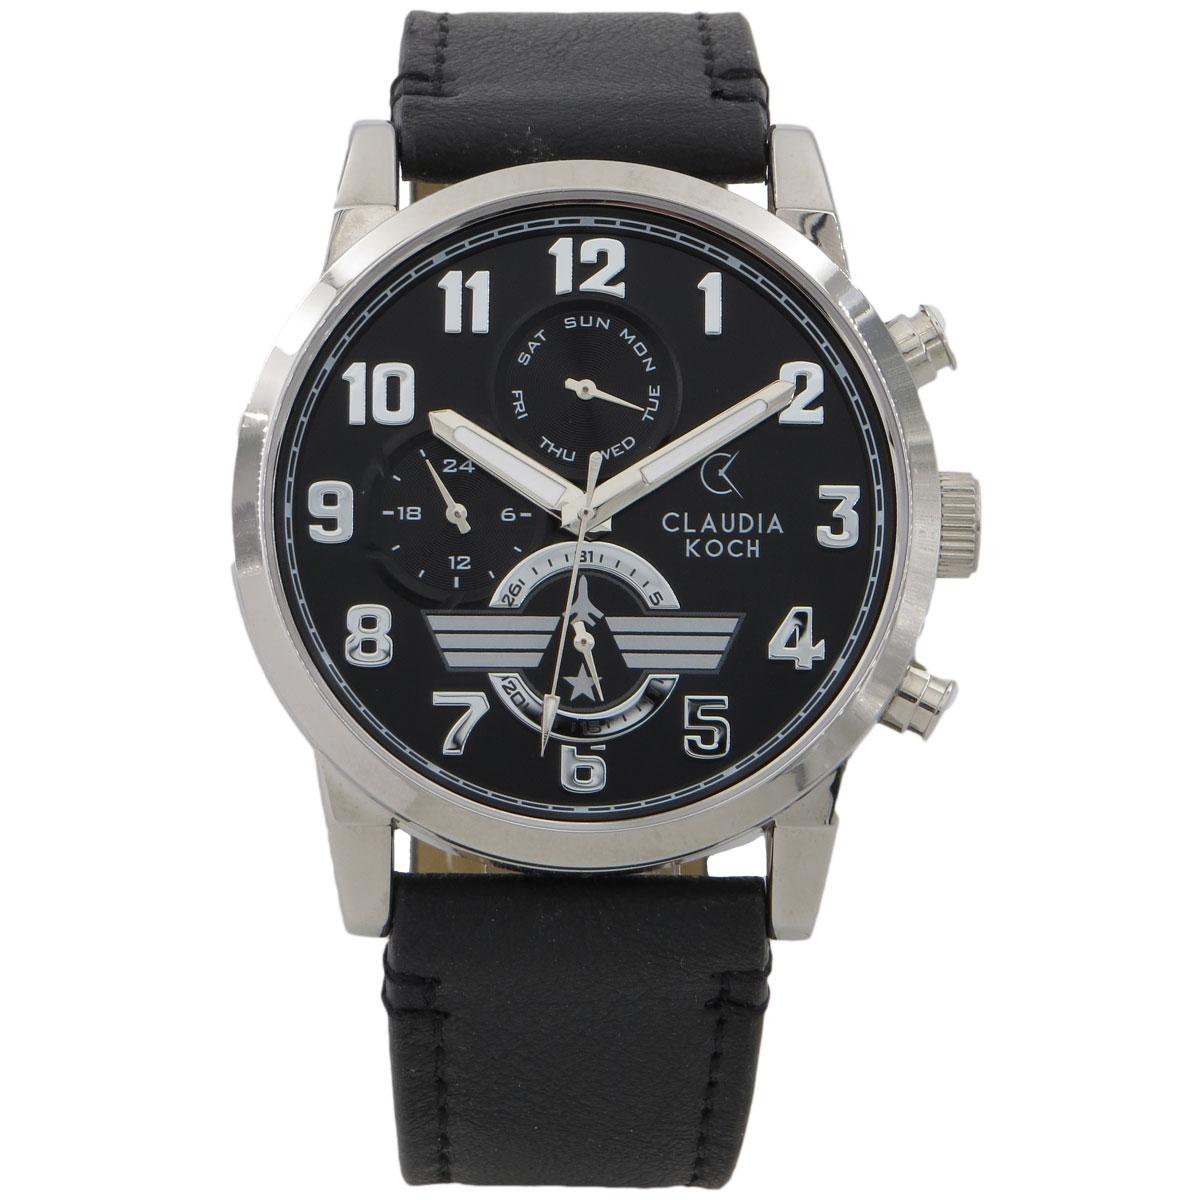 Claudia-Koch-Watches-Men-CK-7260-BKS